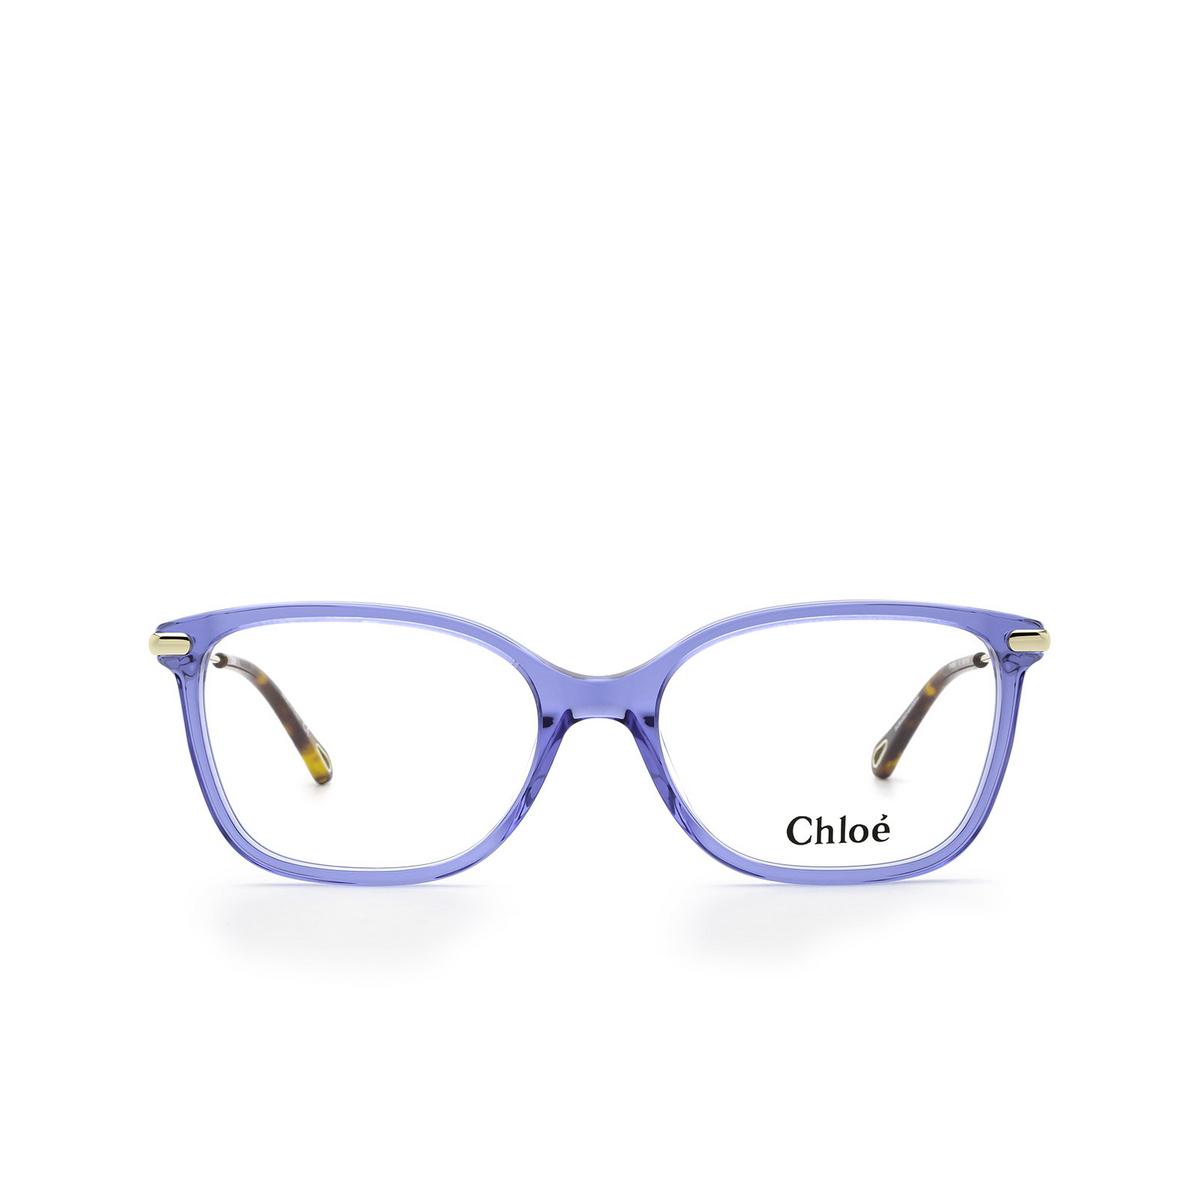 Chloé® Rectangle Eyeglasses: CH0059O color Blue 012 - front view.